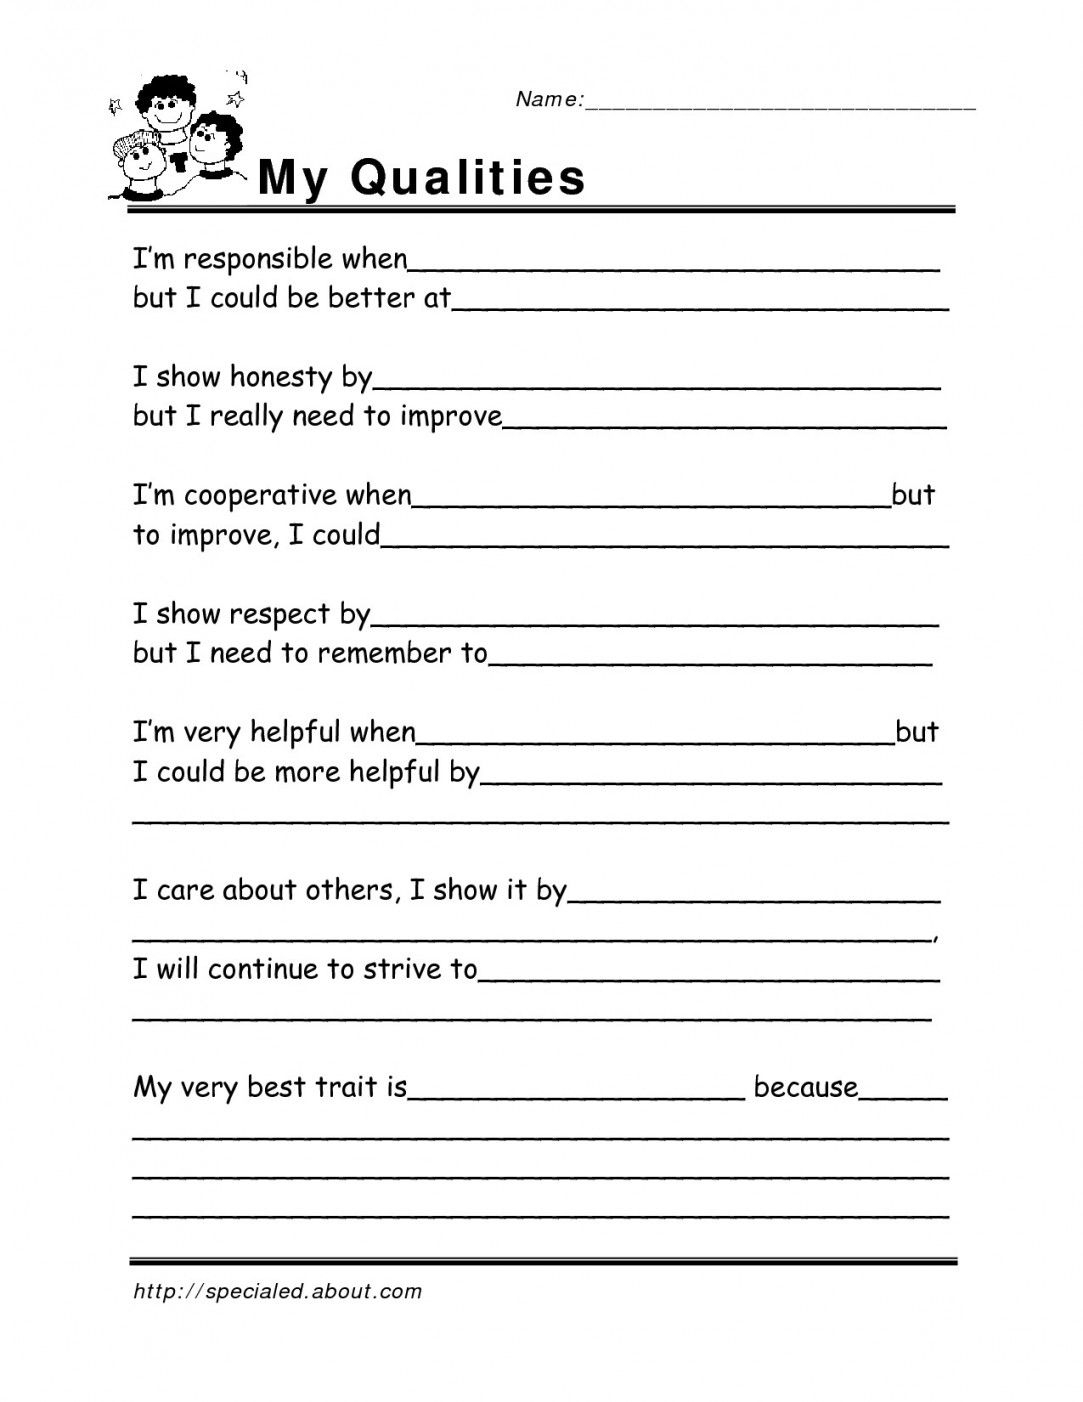 Free Printable Coping Skills Worksheets | Lostranquillos - Free Printable Coping Skills Worksheets For Adults